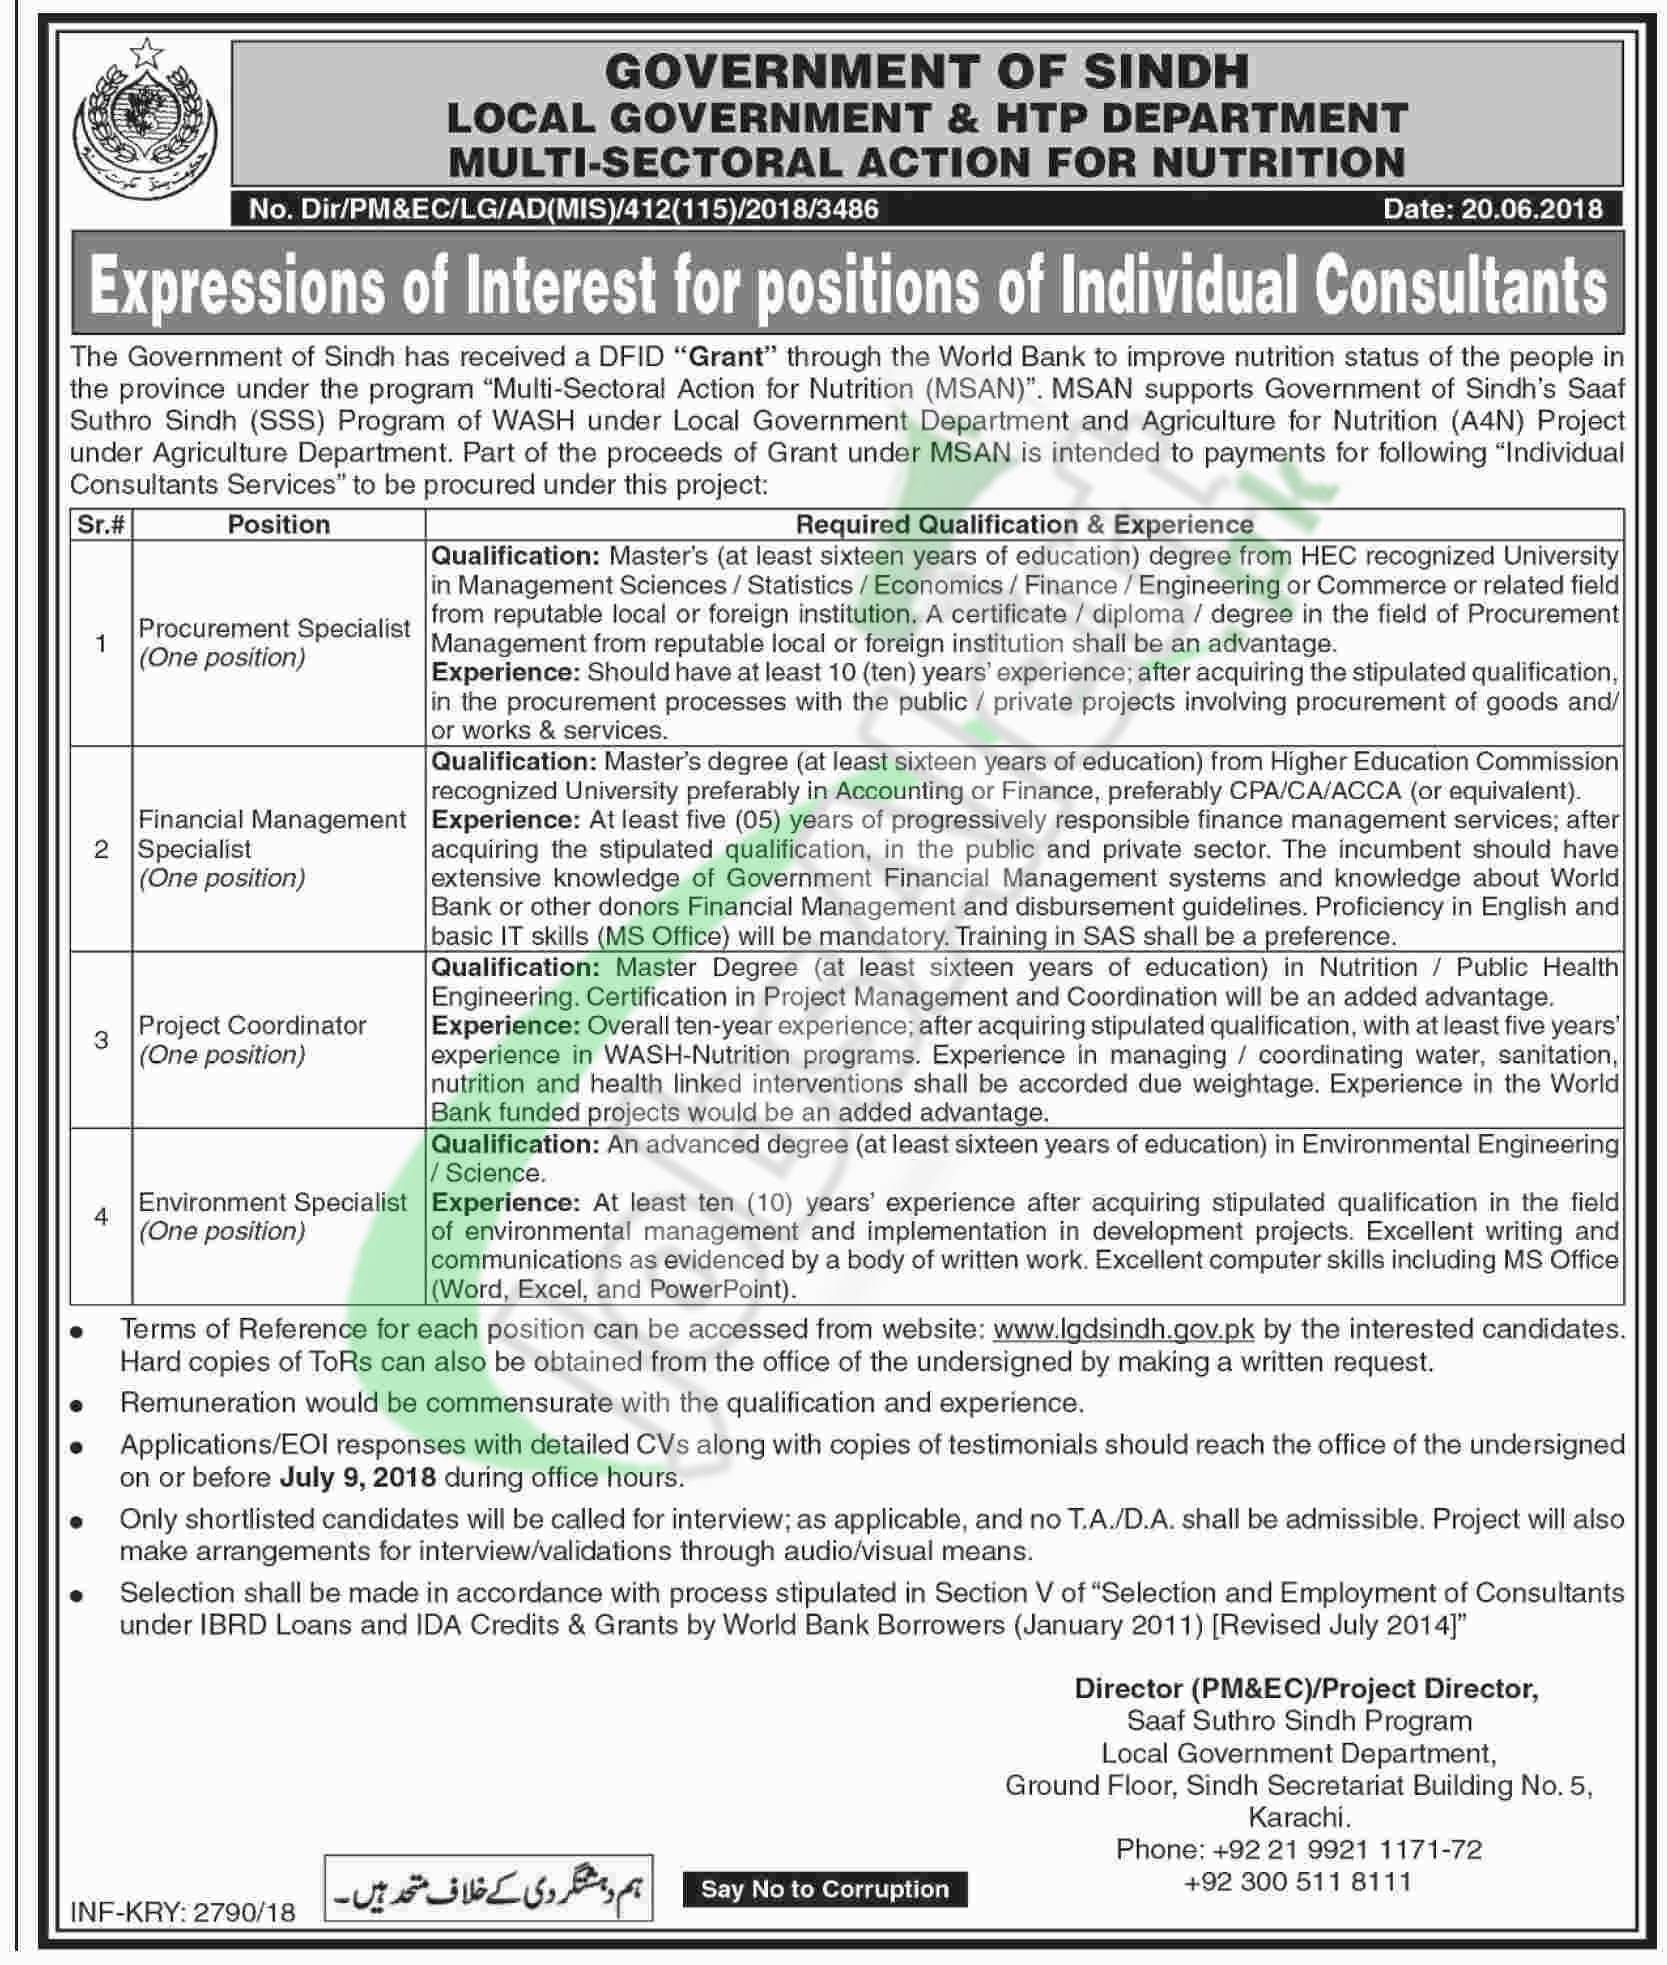 Sindh Local Government Jobs 2018 Latest Advertisement   www.lgdsindh.gov.pk